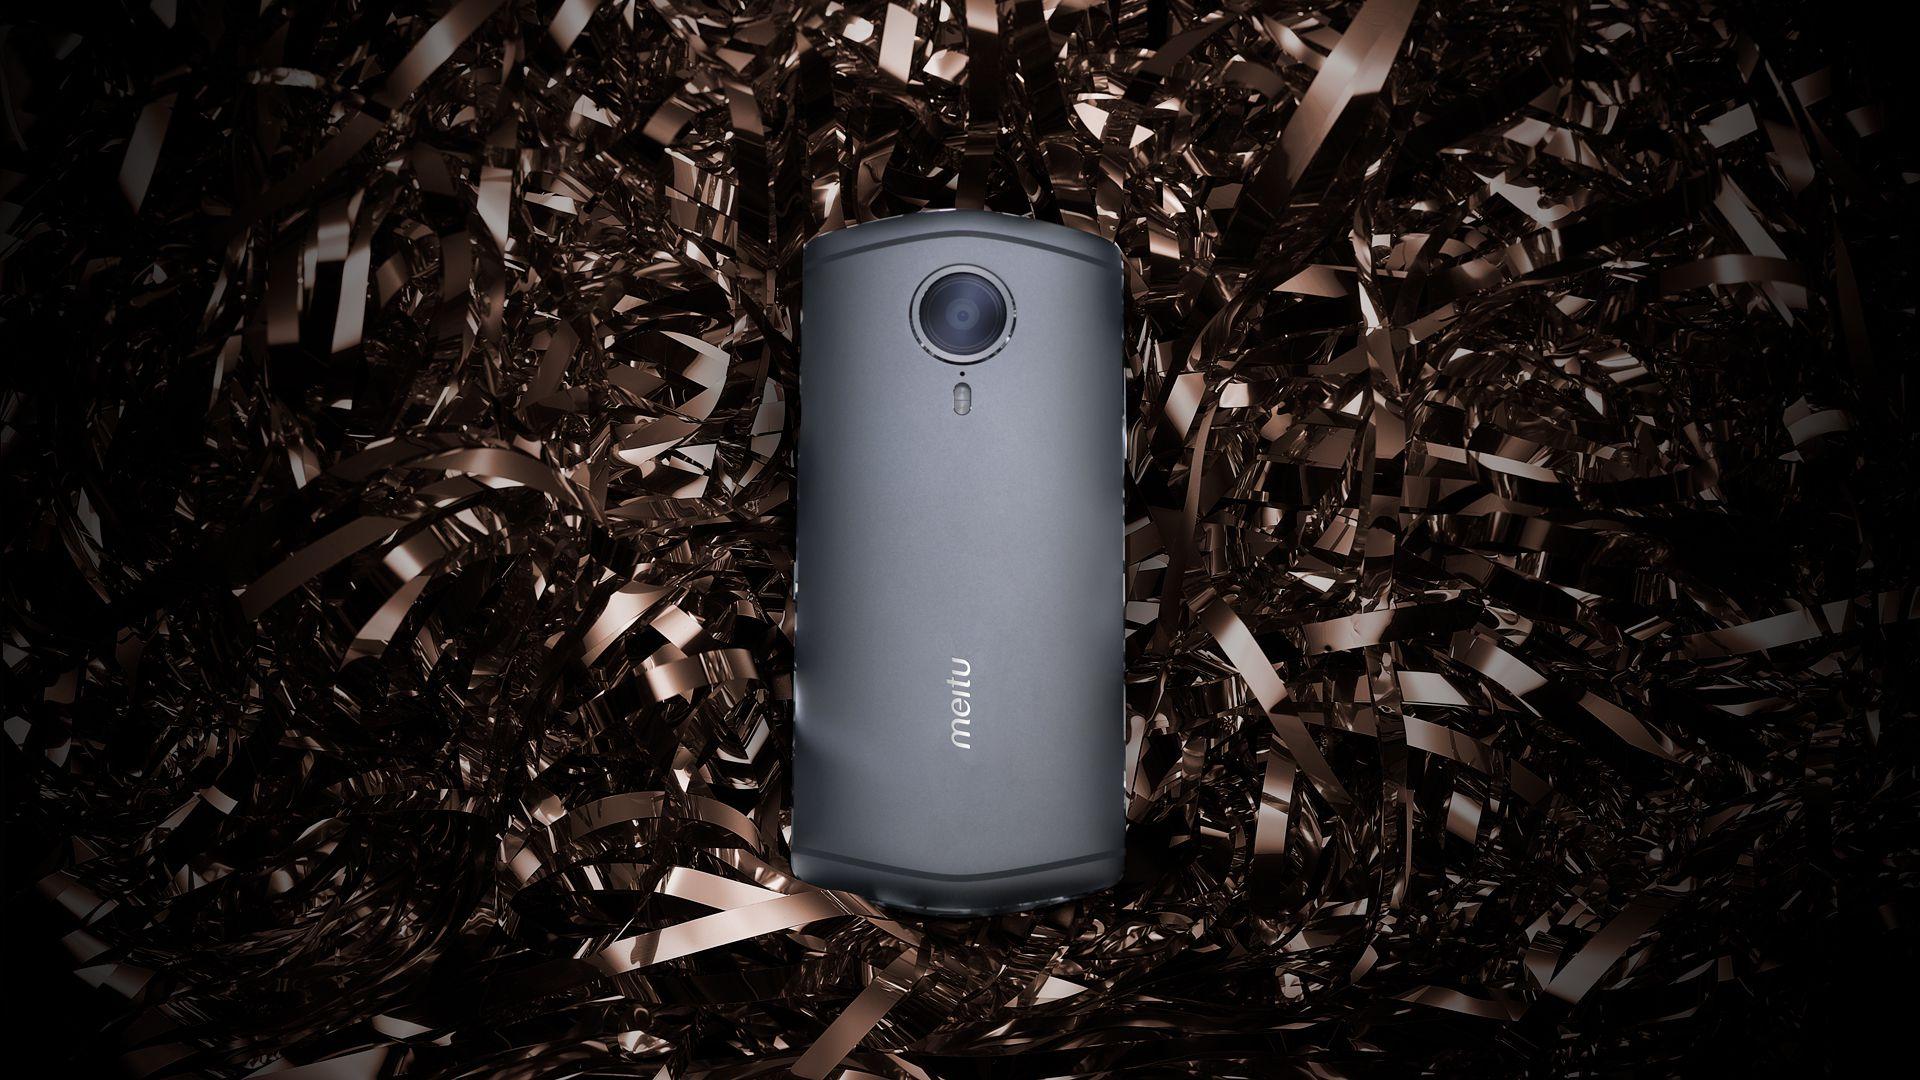 Take beautiful selfies with Meitu's new T8